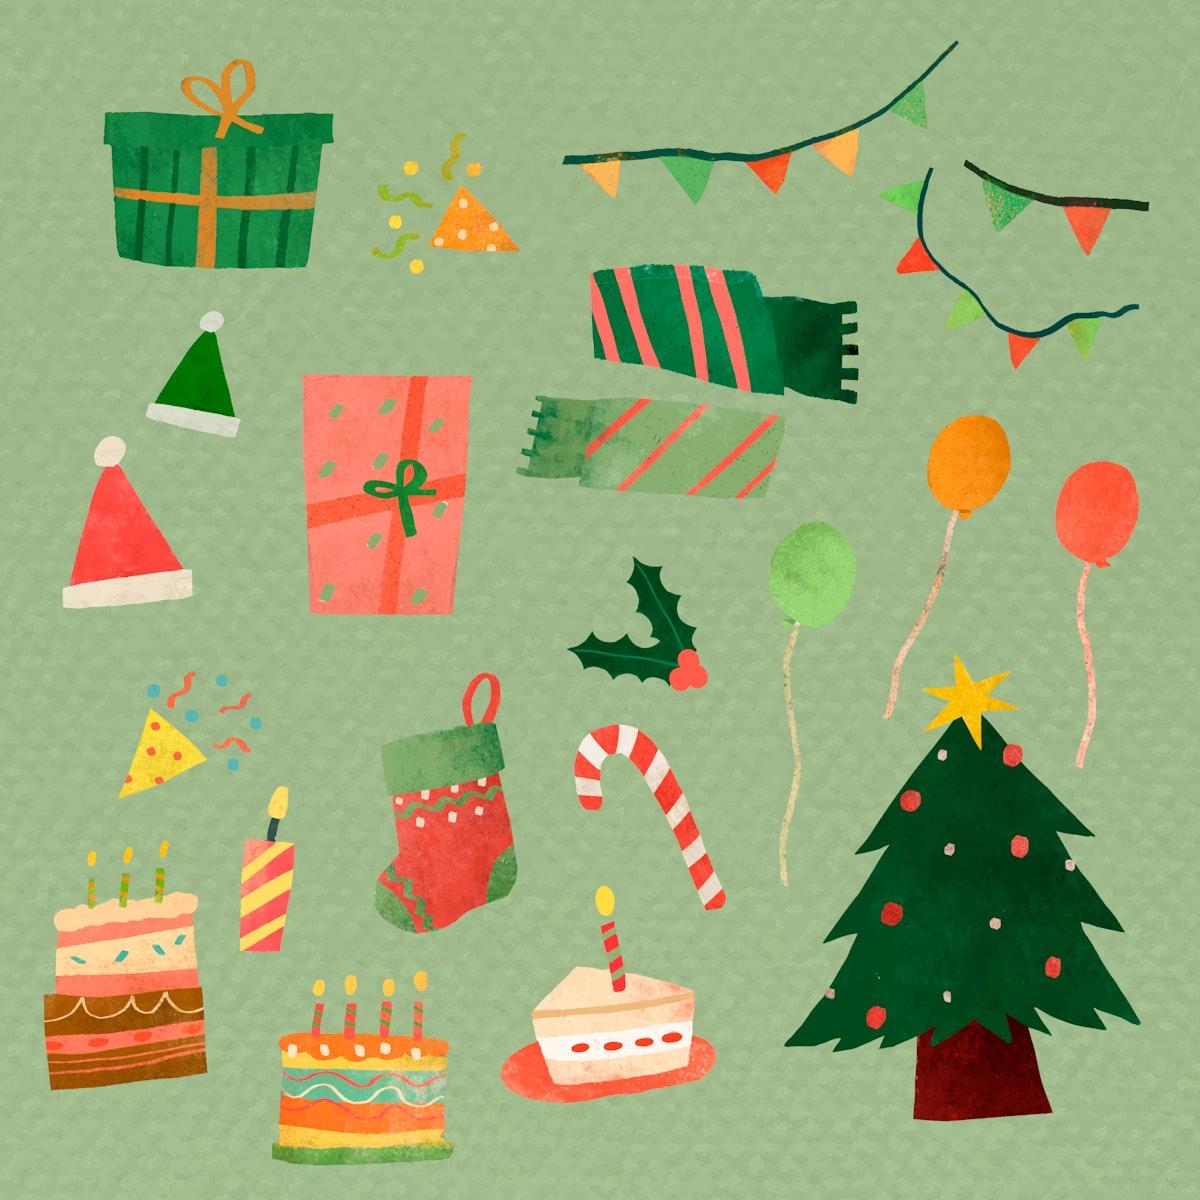 Cute Christmas element set vector